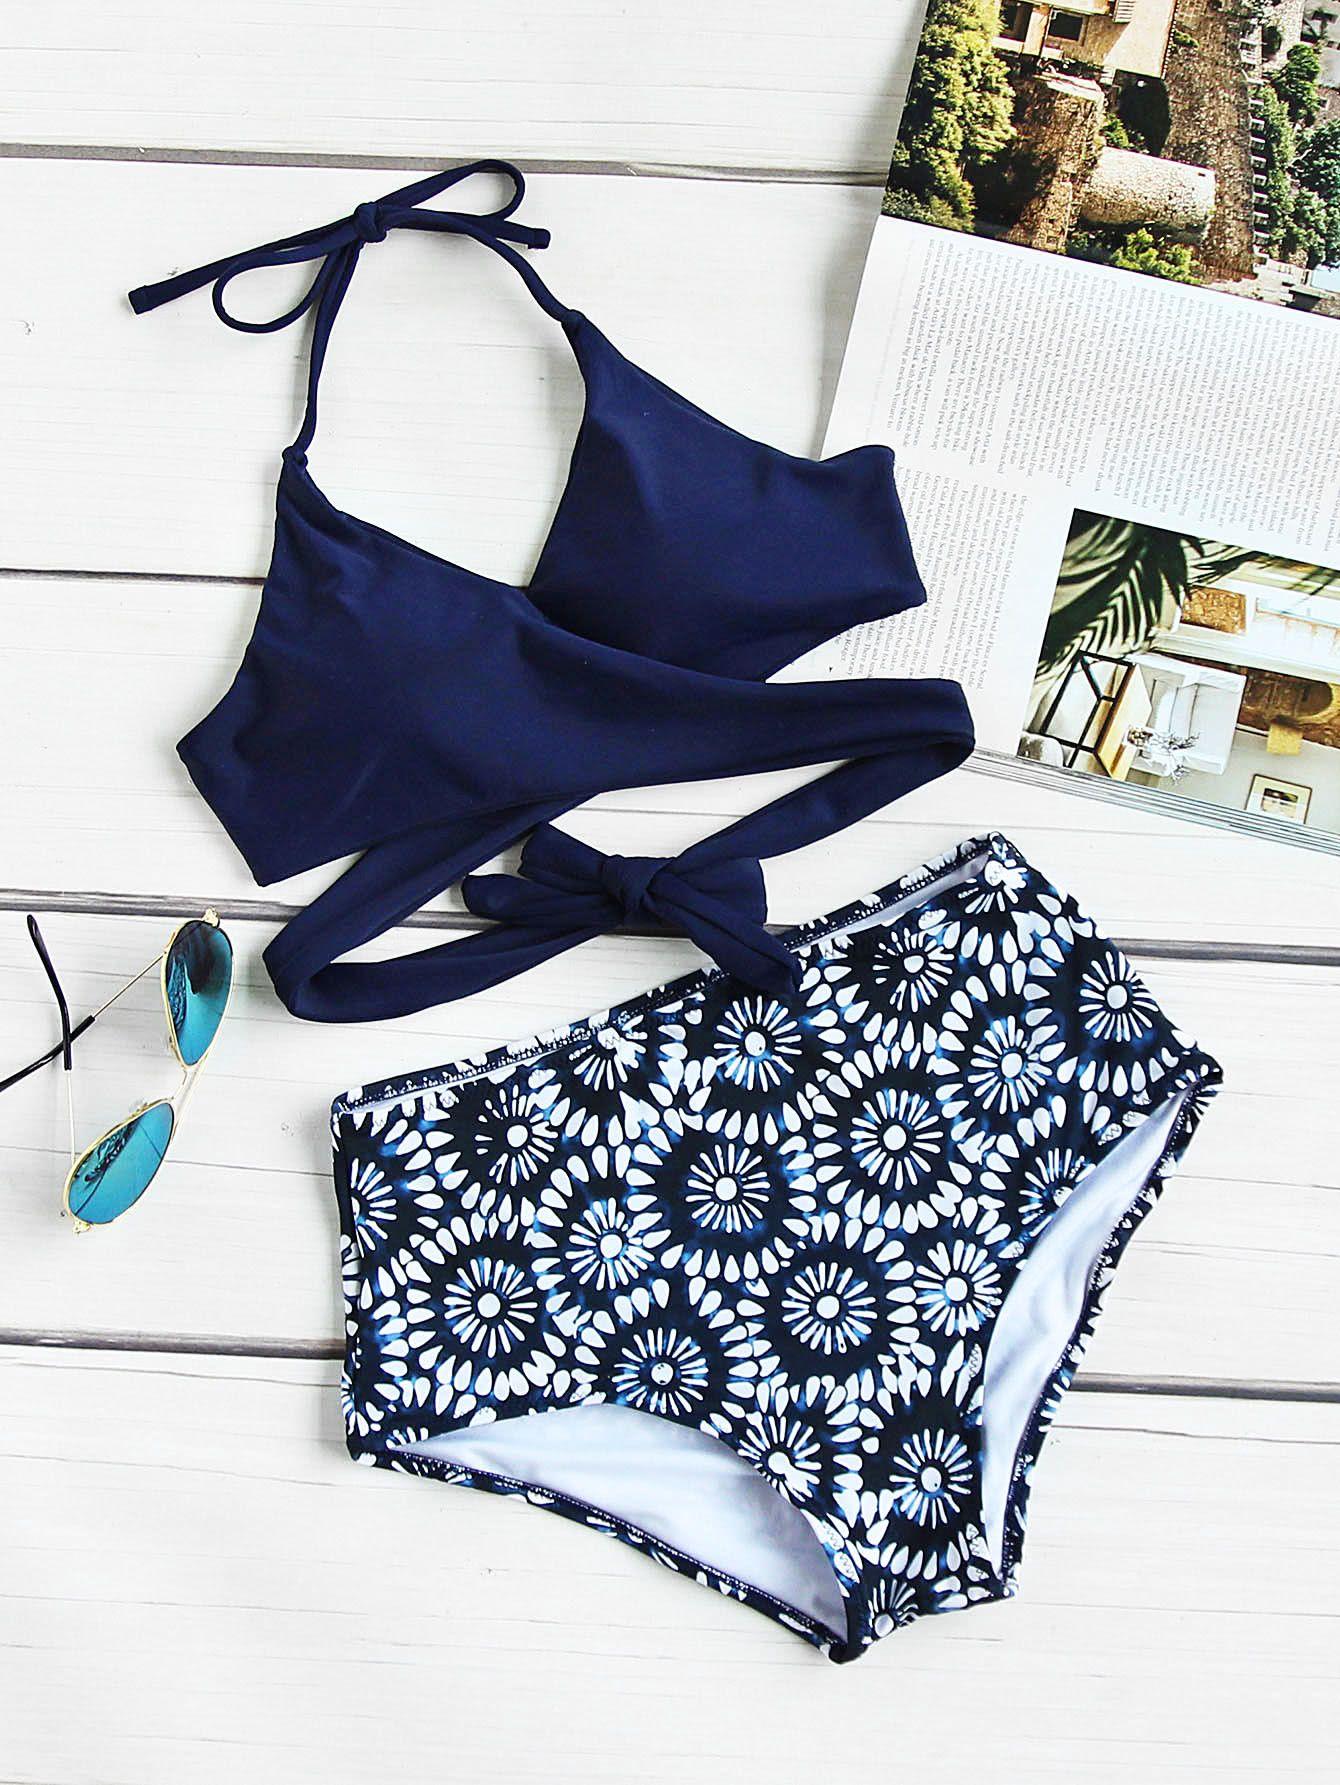 453ef75a7e6ac Calico Print Wrap High Waist Bikini SetFor Women-romwe   bikini ...